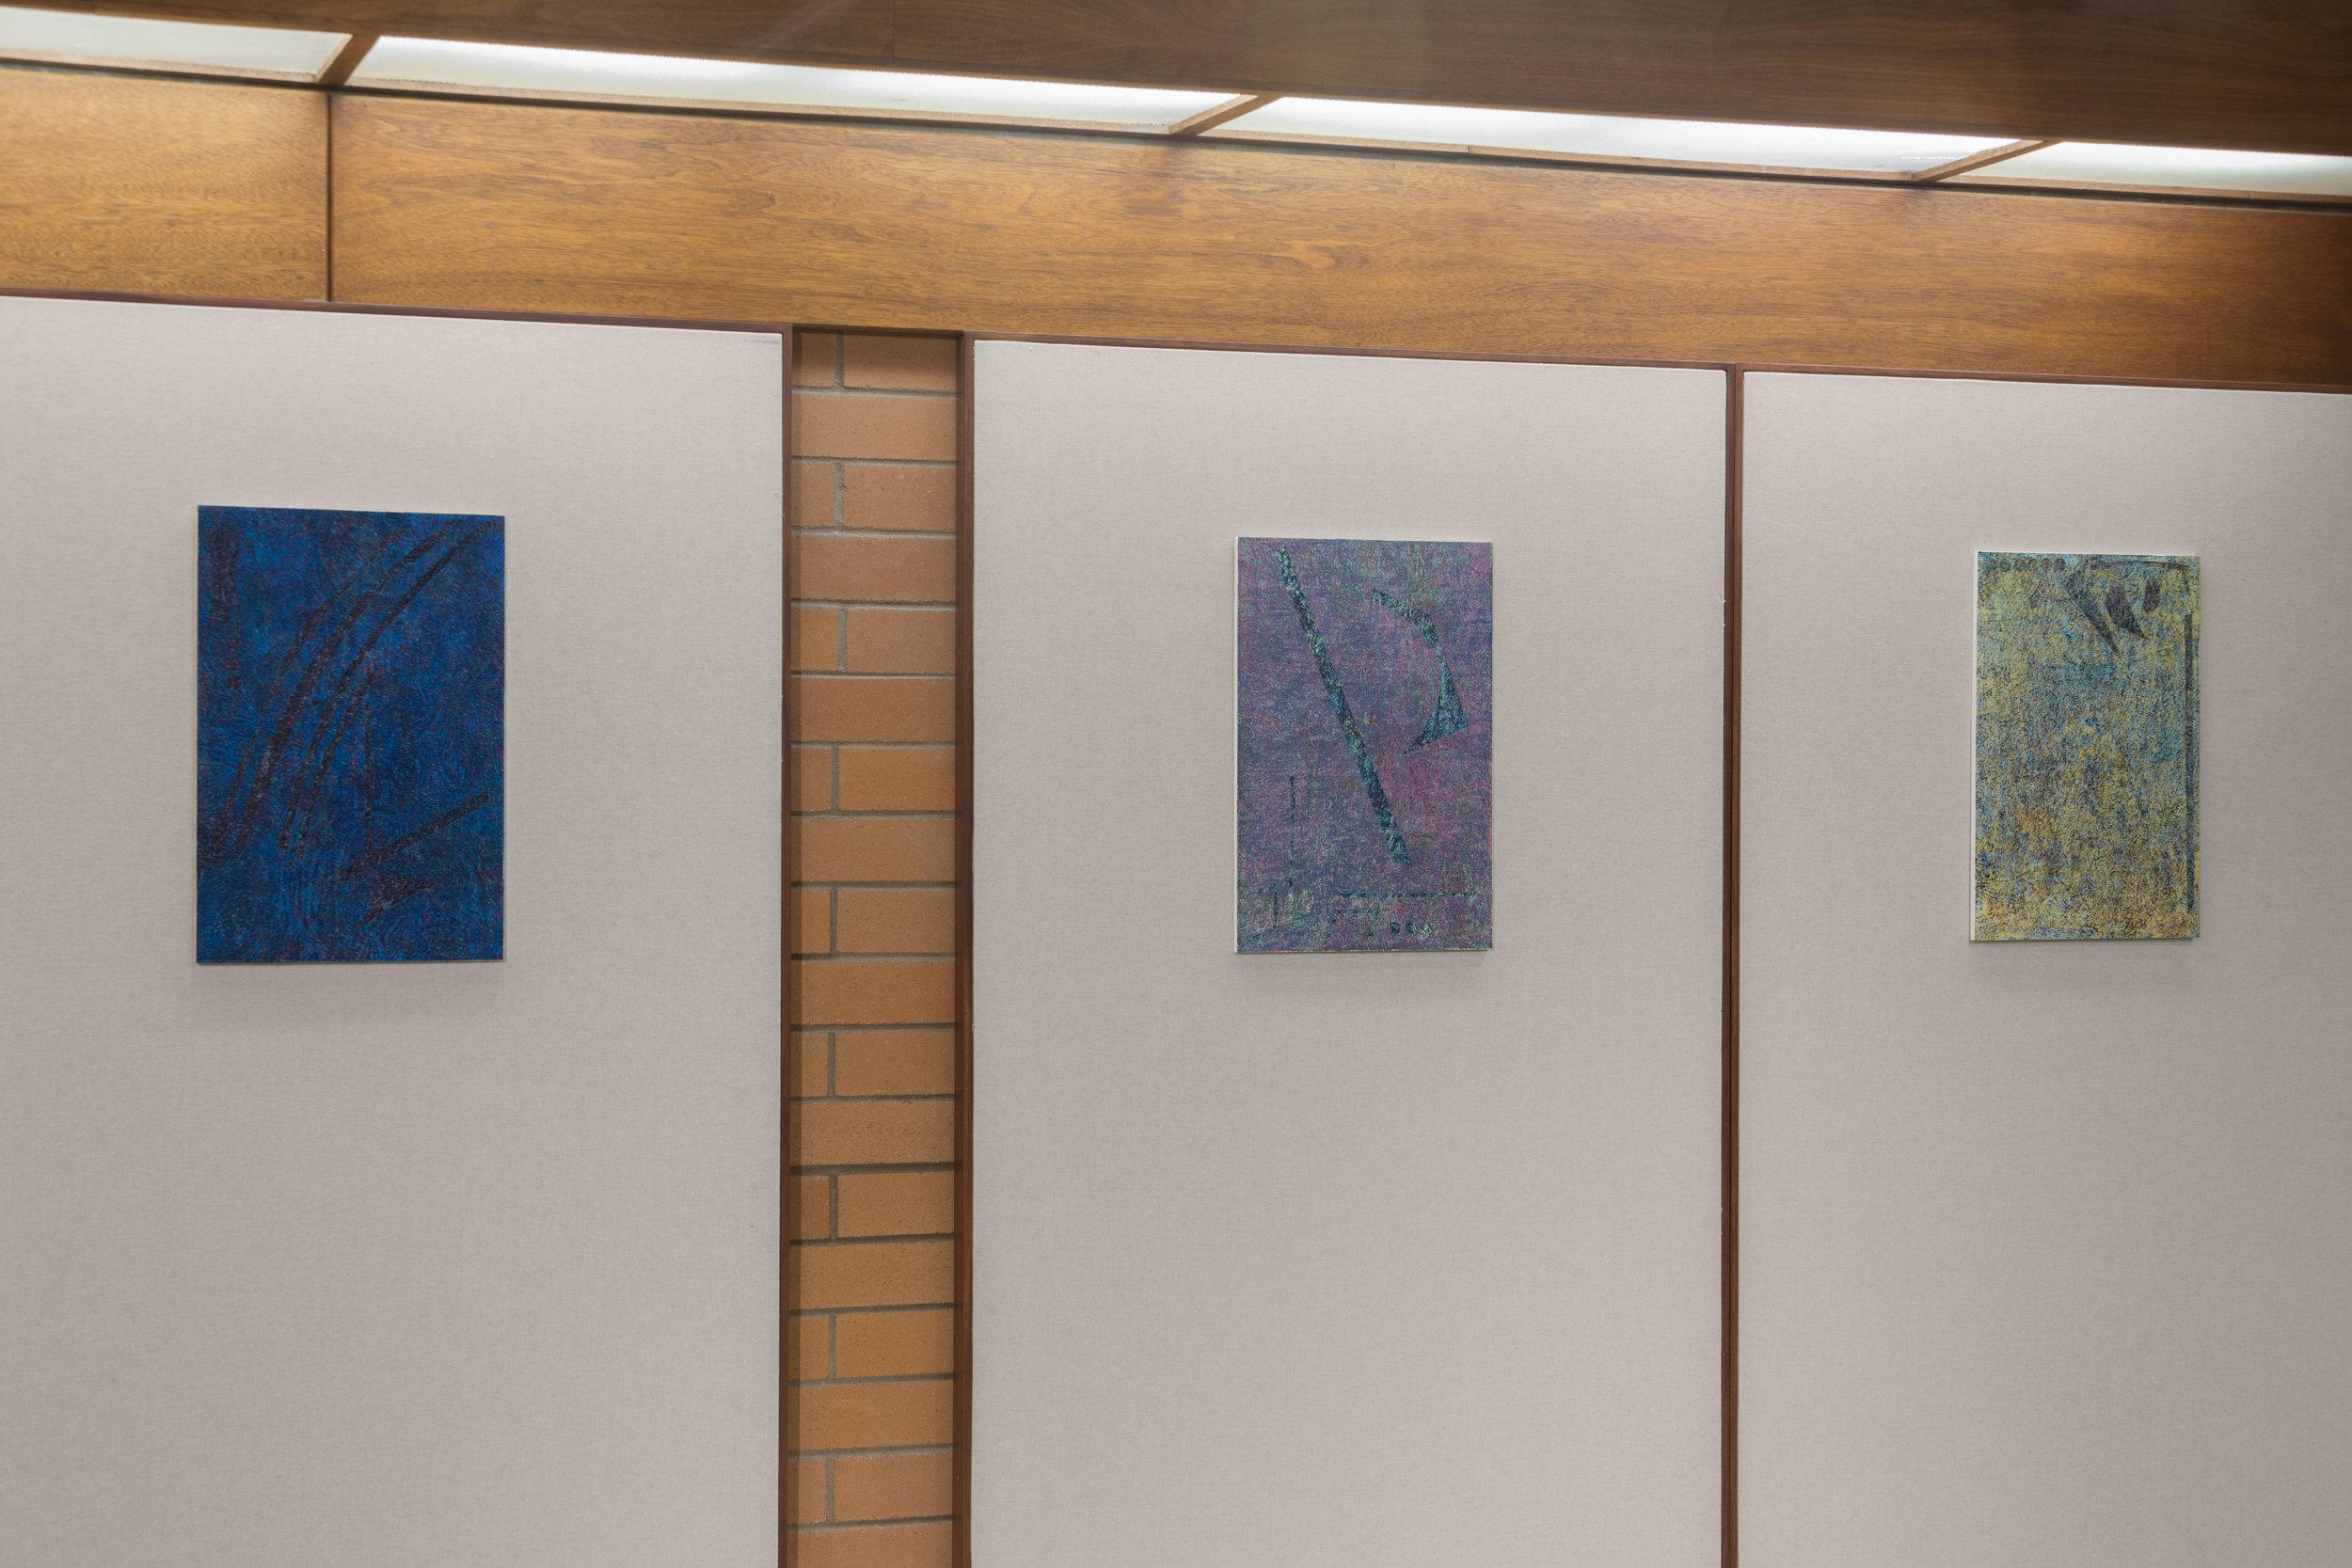 Field of Irisarri (Variation 1-3), Woodblock prints & MDF Board, Shoreline Community College, 2017